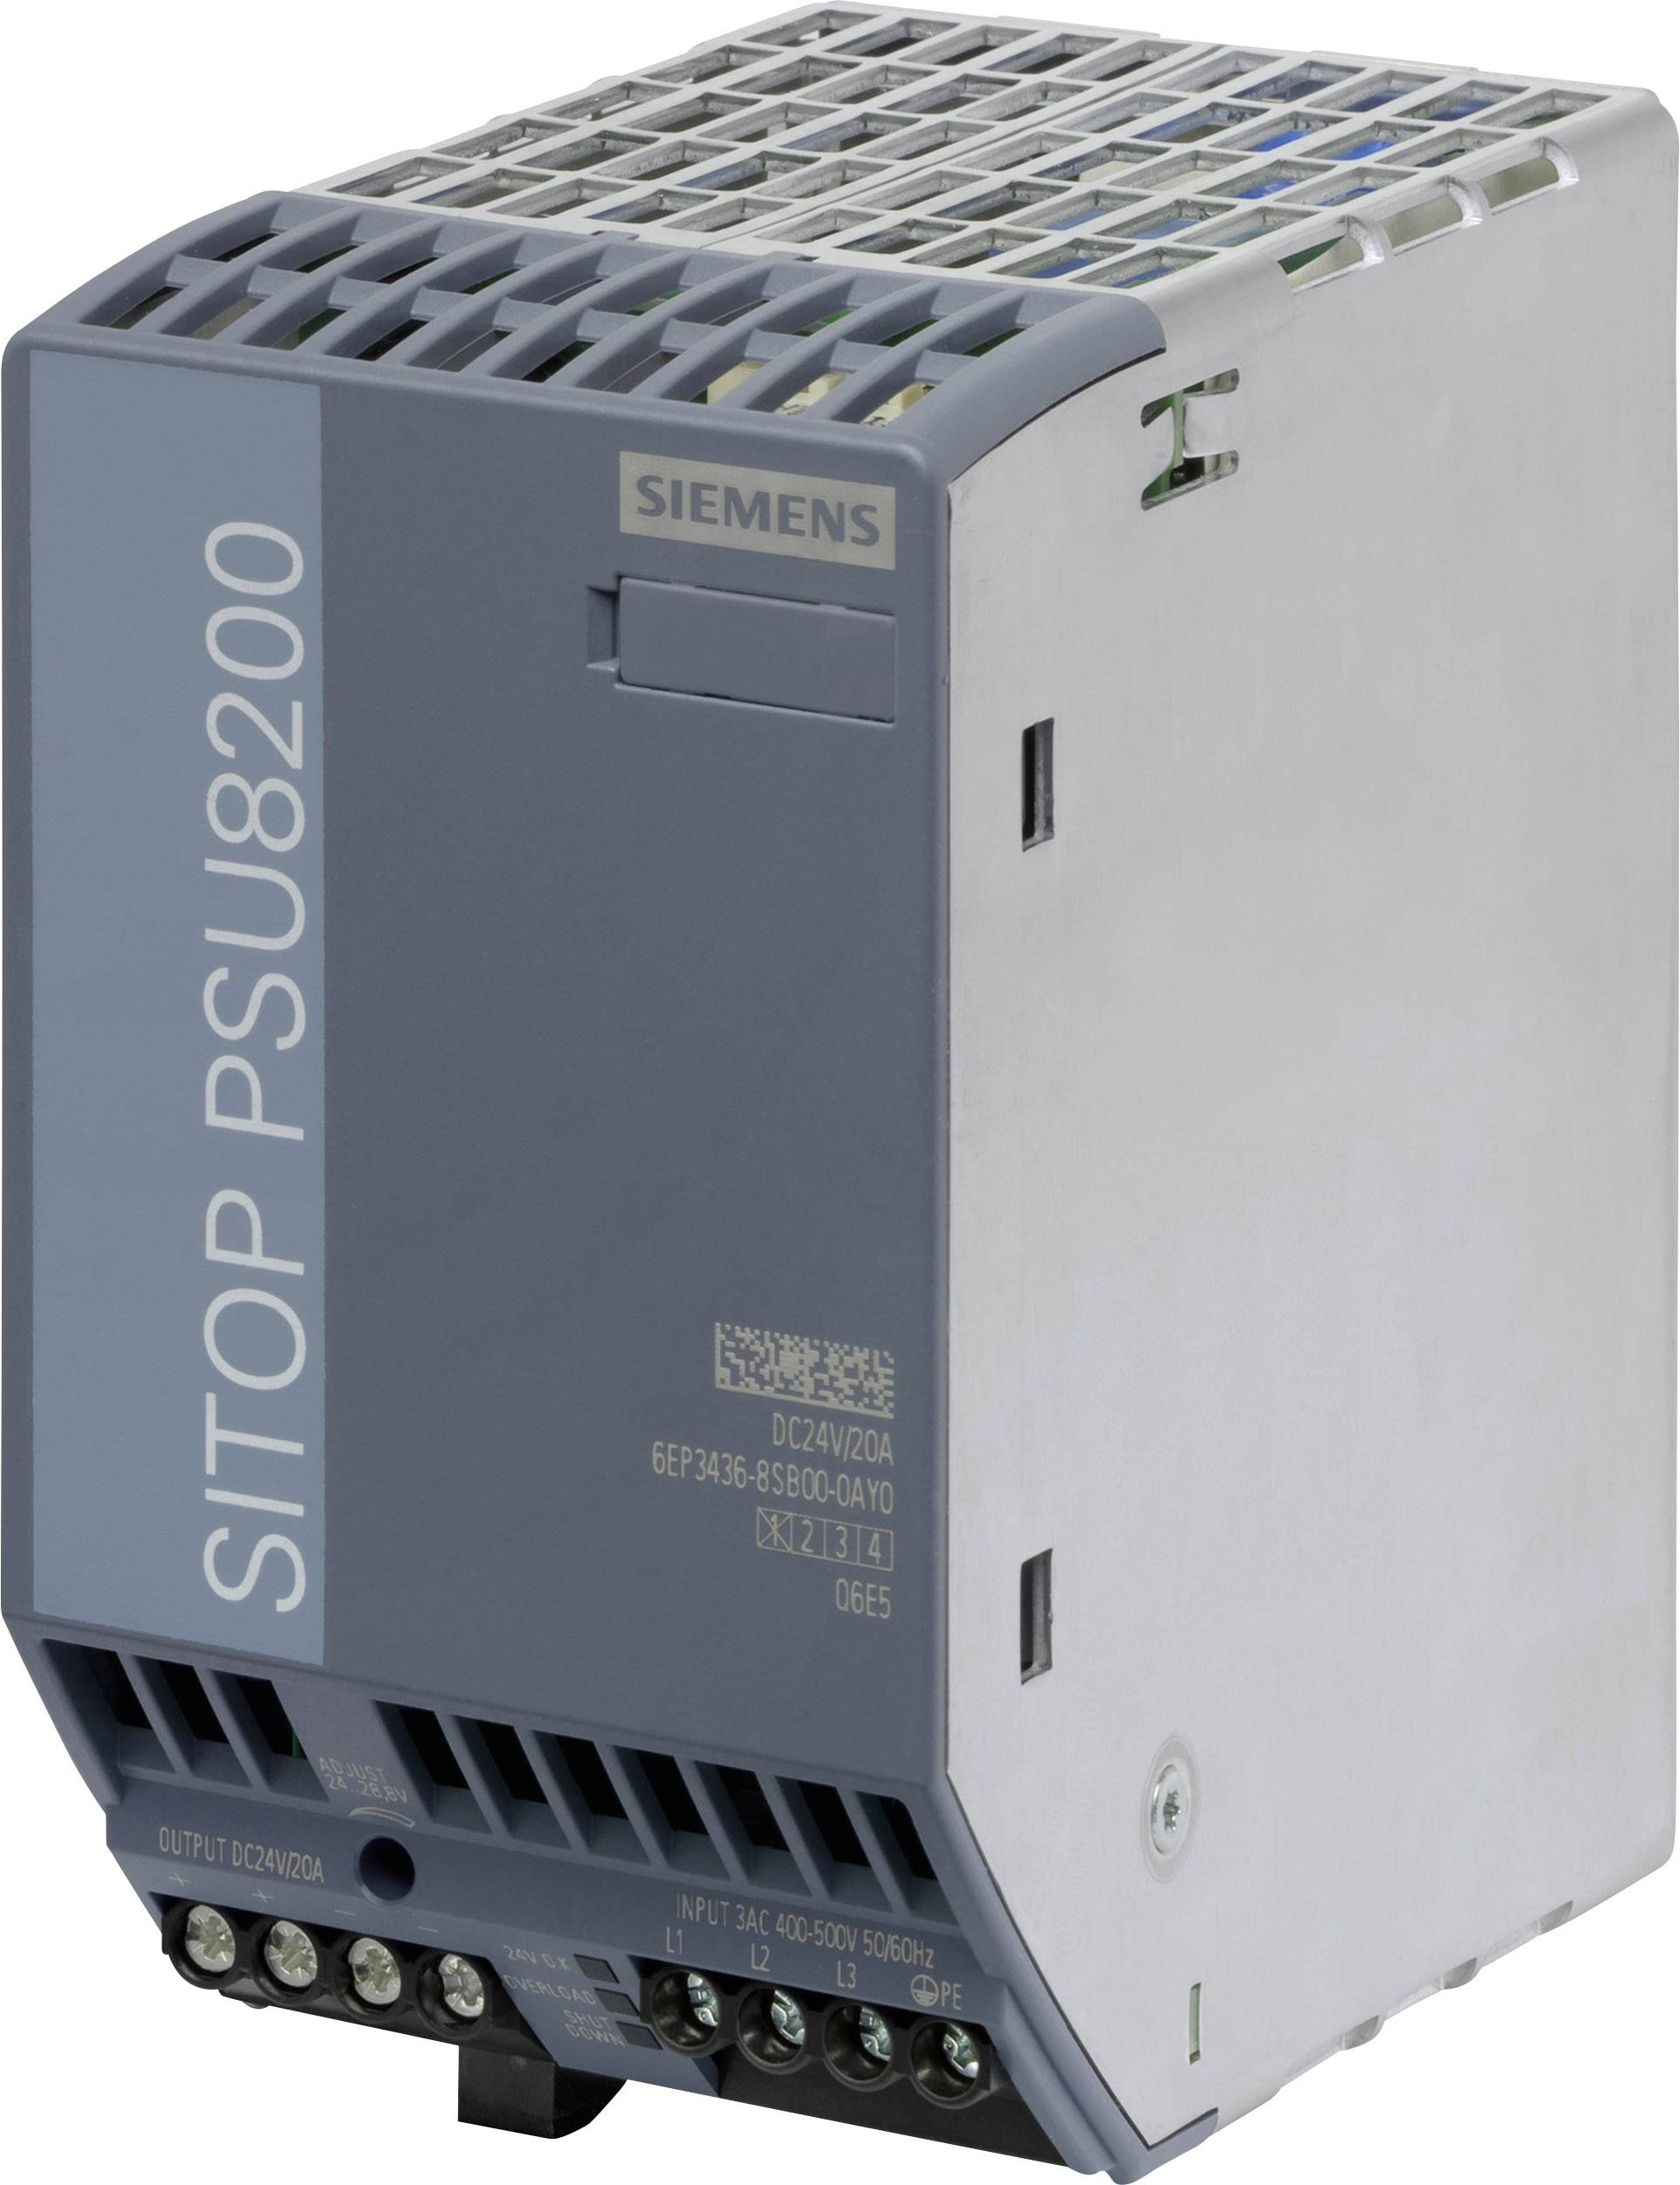 SIEMENS SITOP PSU300M 6EP1 437-3BA10 Power Supply